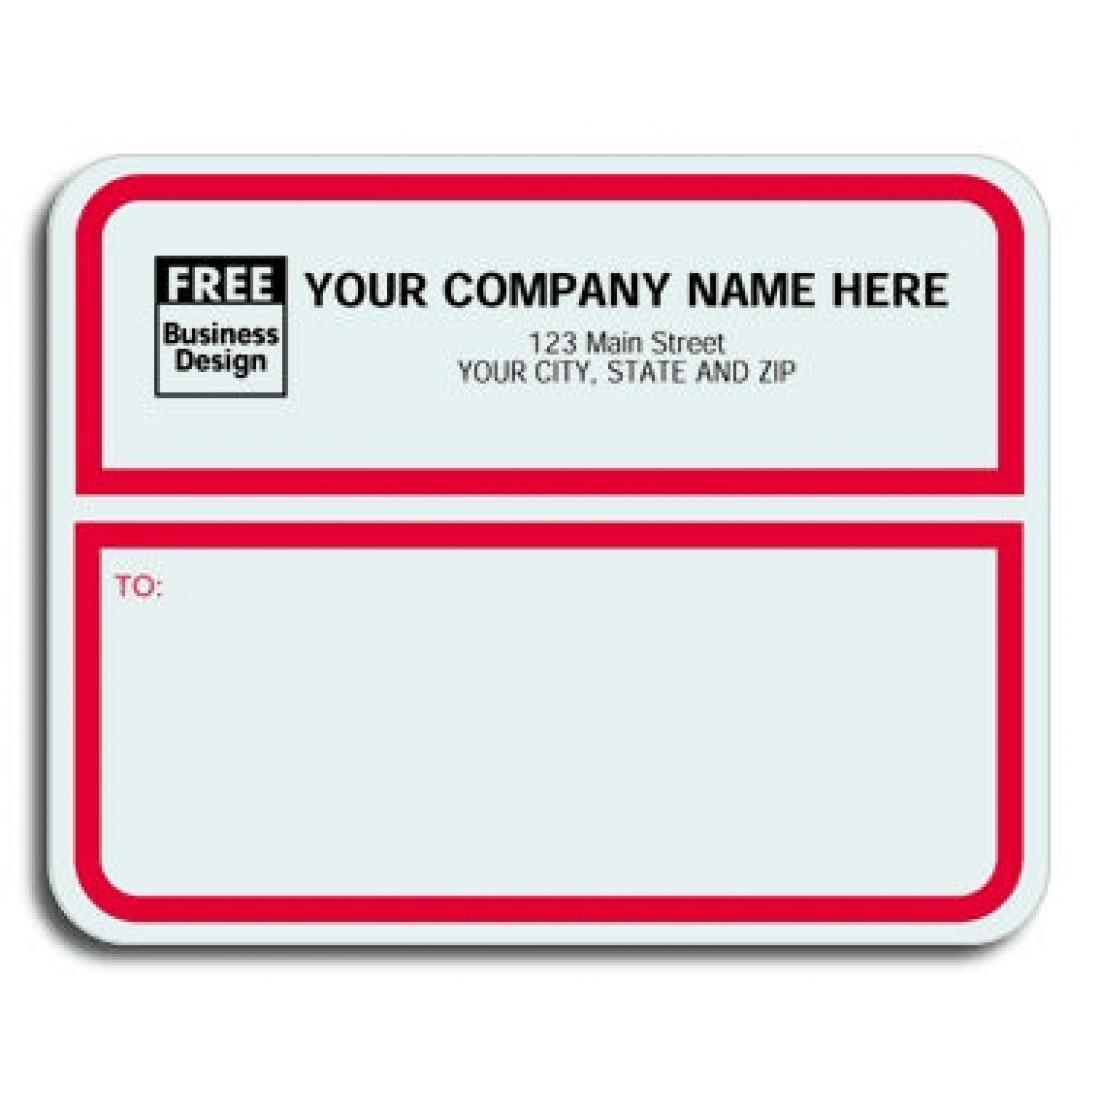 business shipping label - Madran kaptanband co